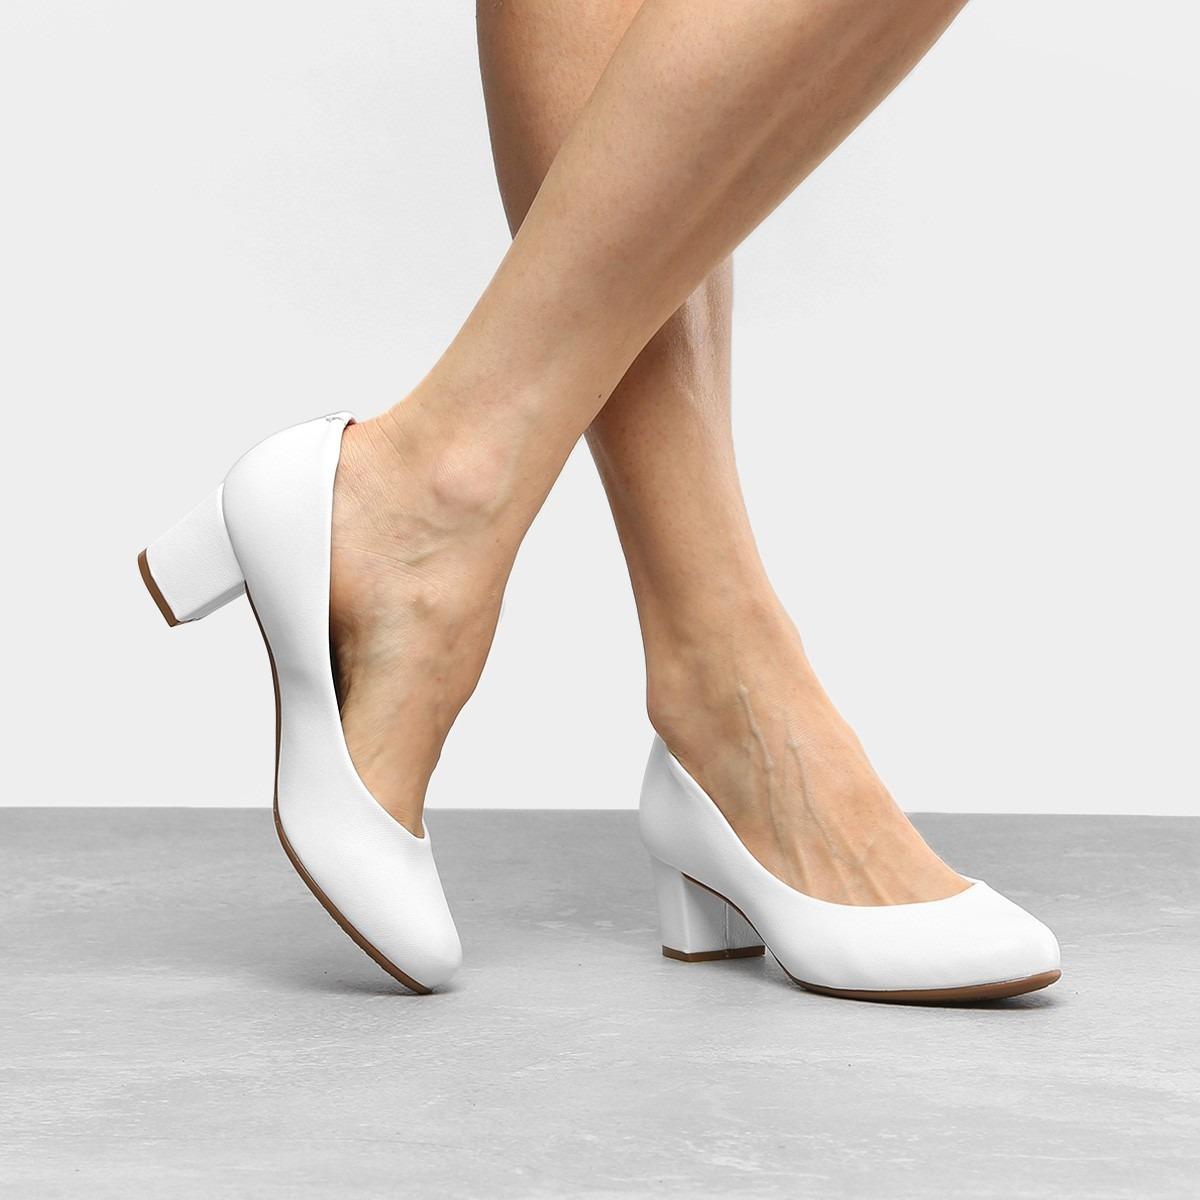 4c35ba0a6f sapato branco scarpin beira rio salto grosso 5cm confort. Carregando zoom.